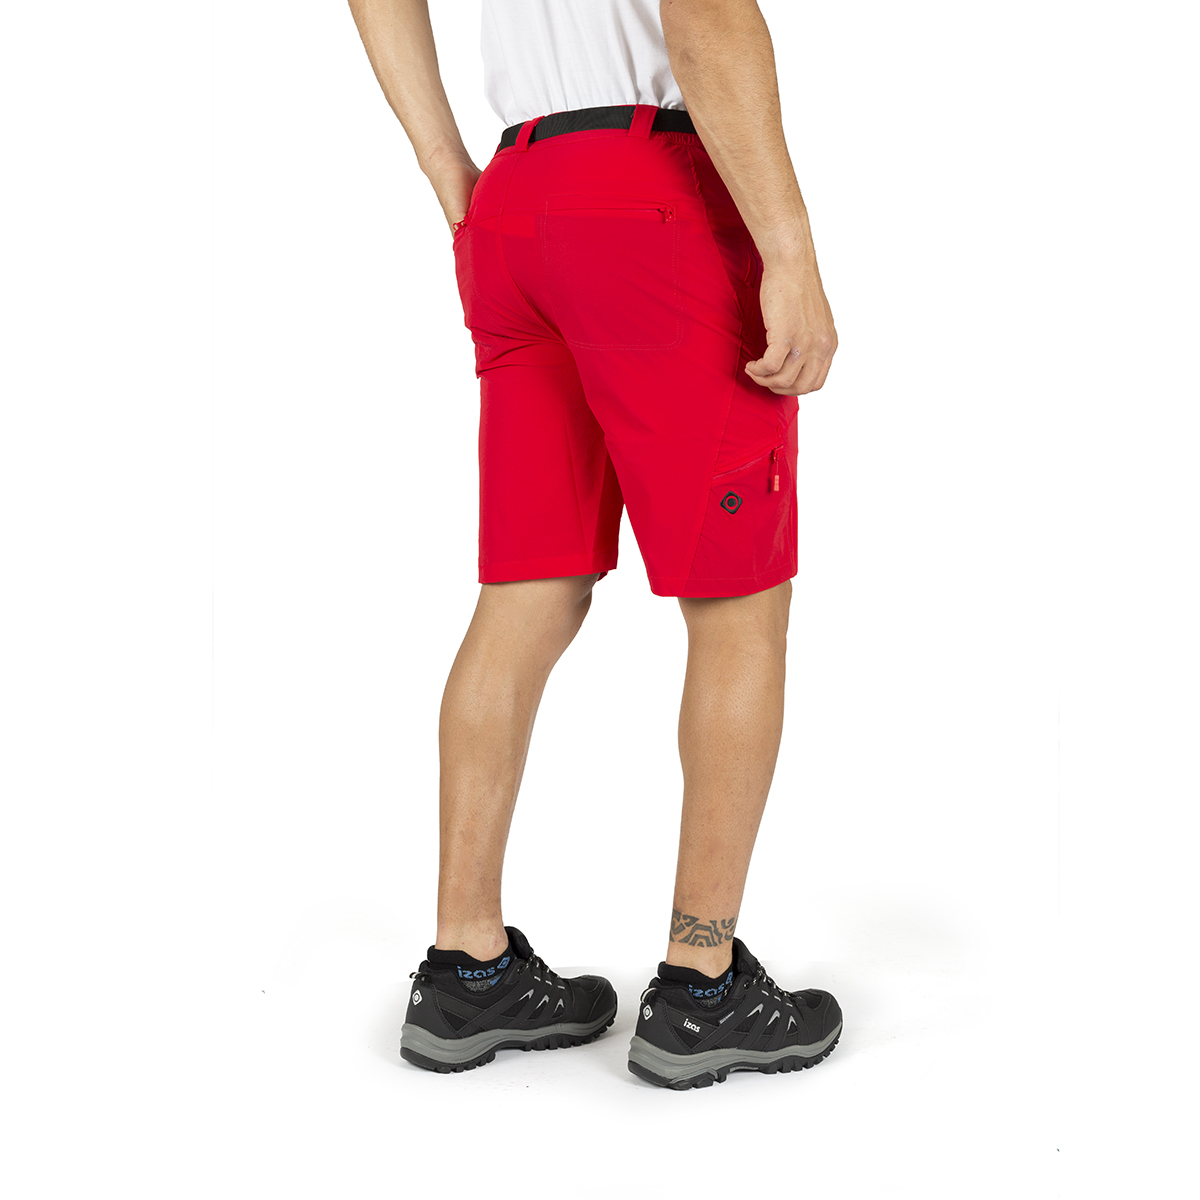 MAN'S PEAK STRETCH SHORT PANT RED